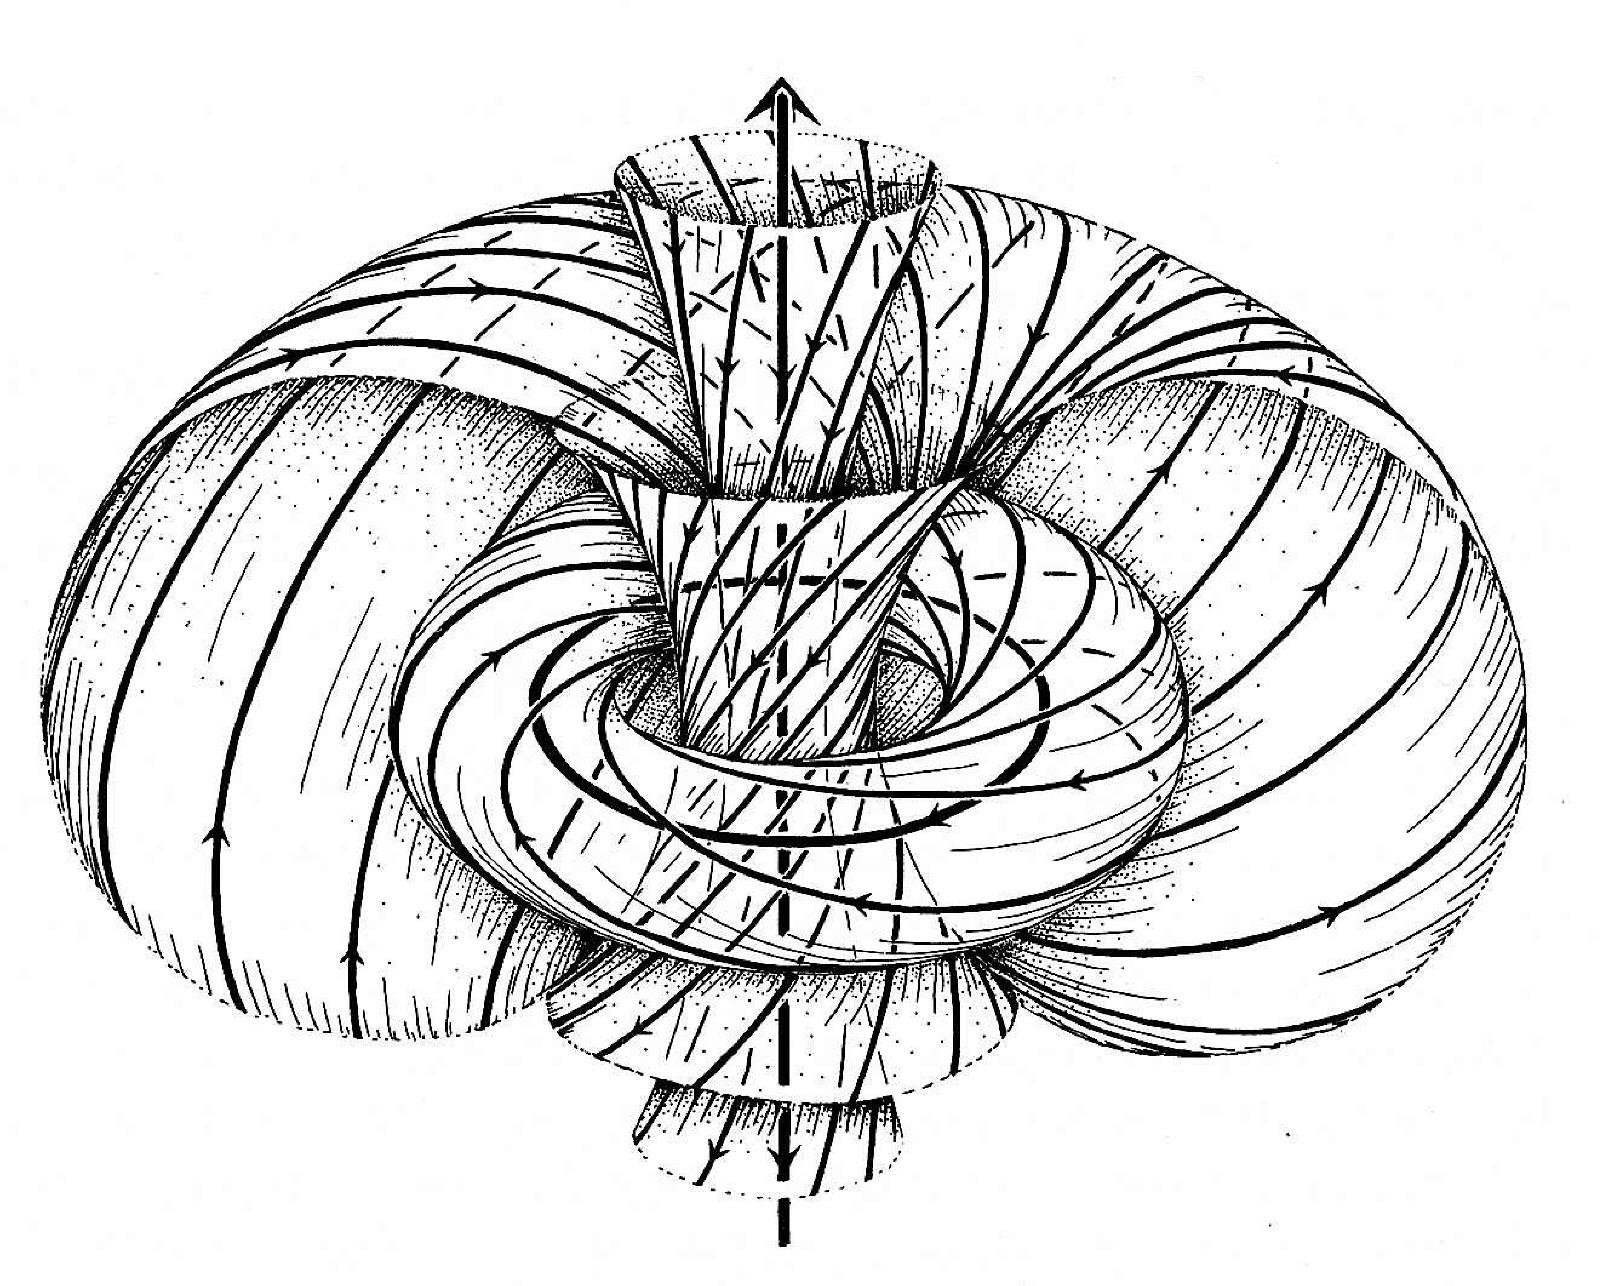 Okternionen geometrisch dargestellt